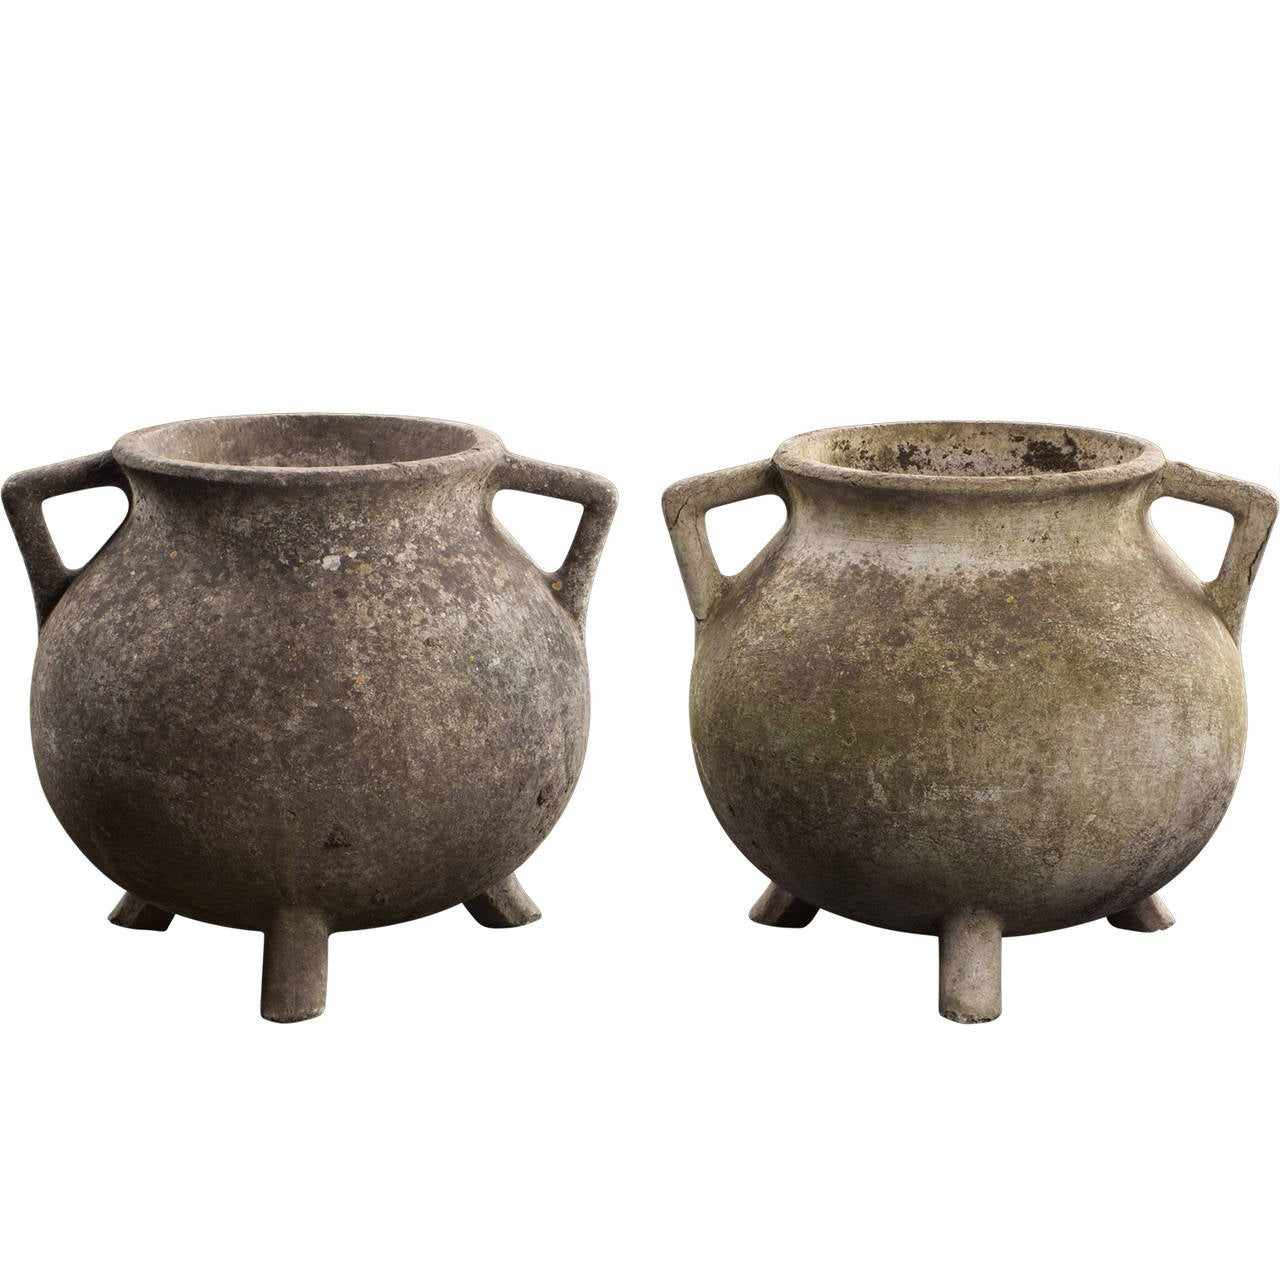 Concrete Garden Pots Concrete garden pots at 1stdibs concrete garden pots for sale workwithnaturefo